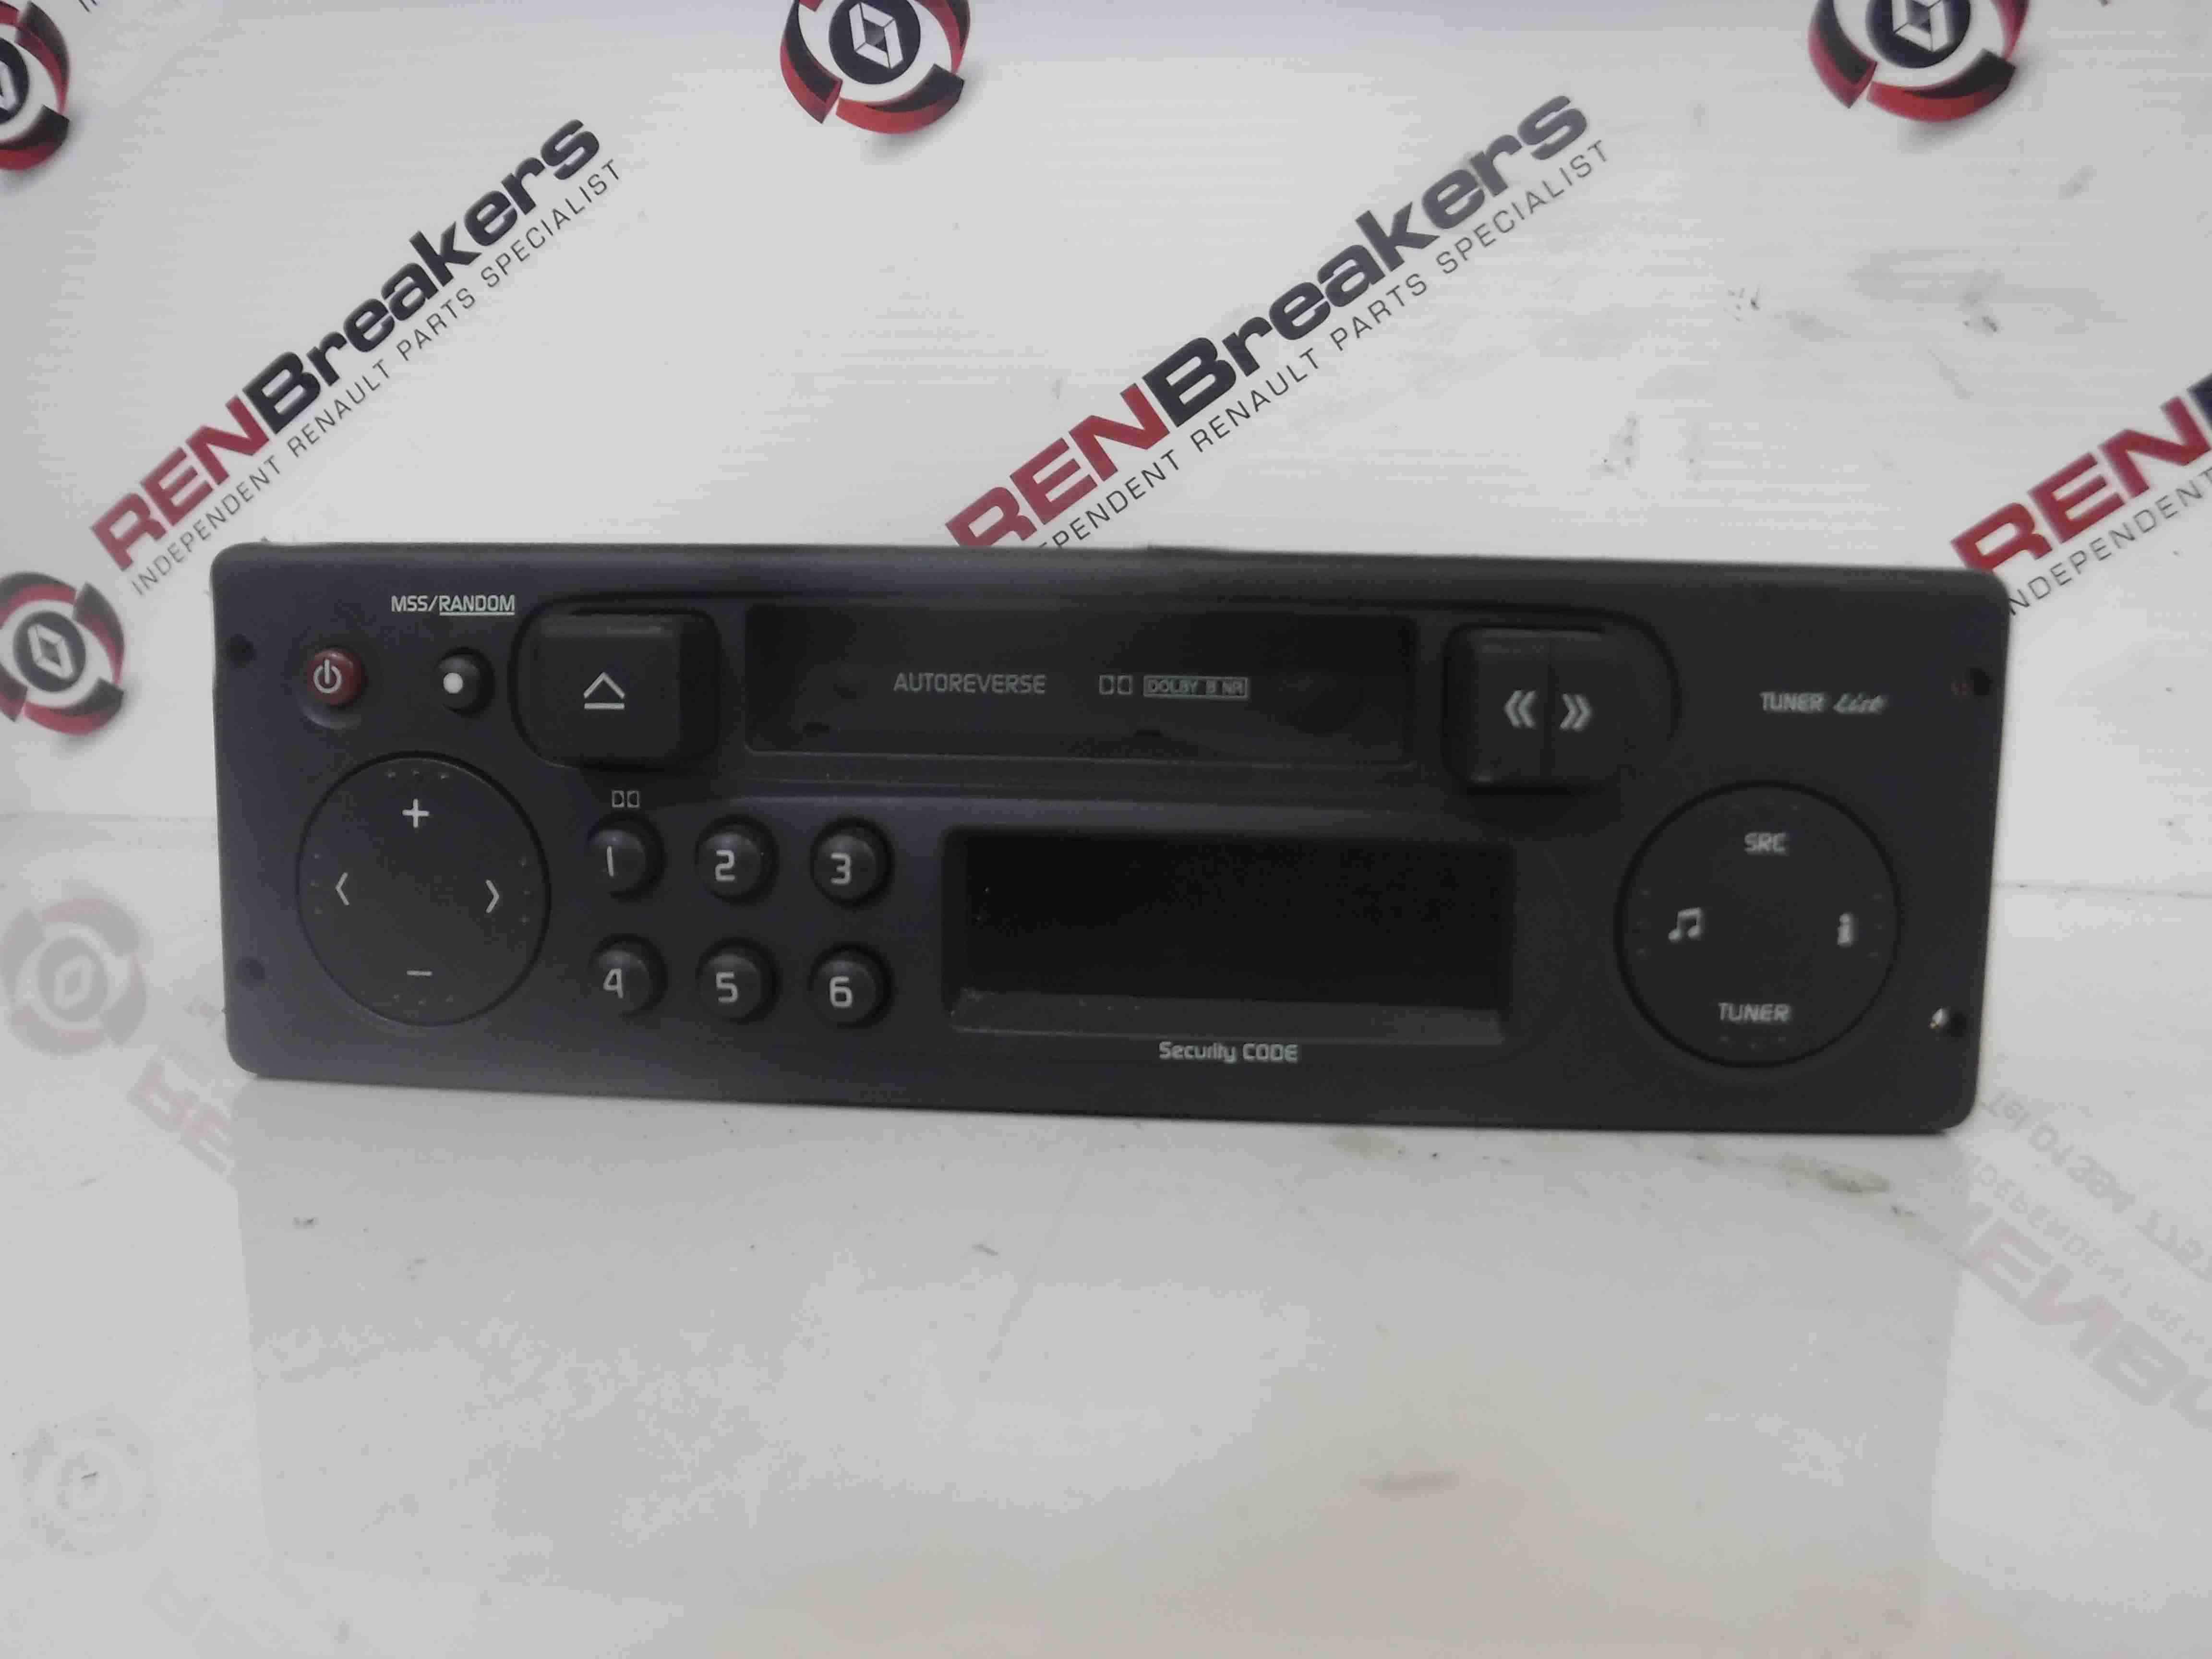 Renault Clio MK2 2001-2006 Radio Tape Casette Player + Code 8200113800